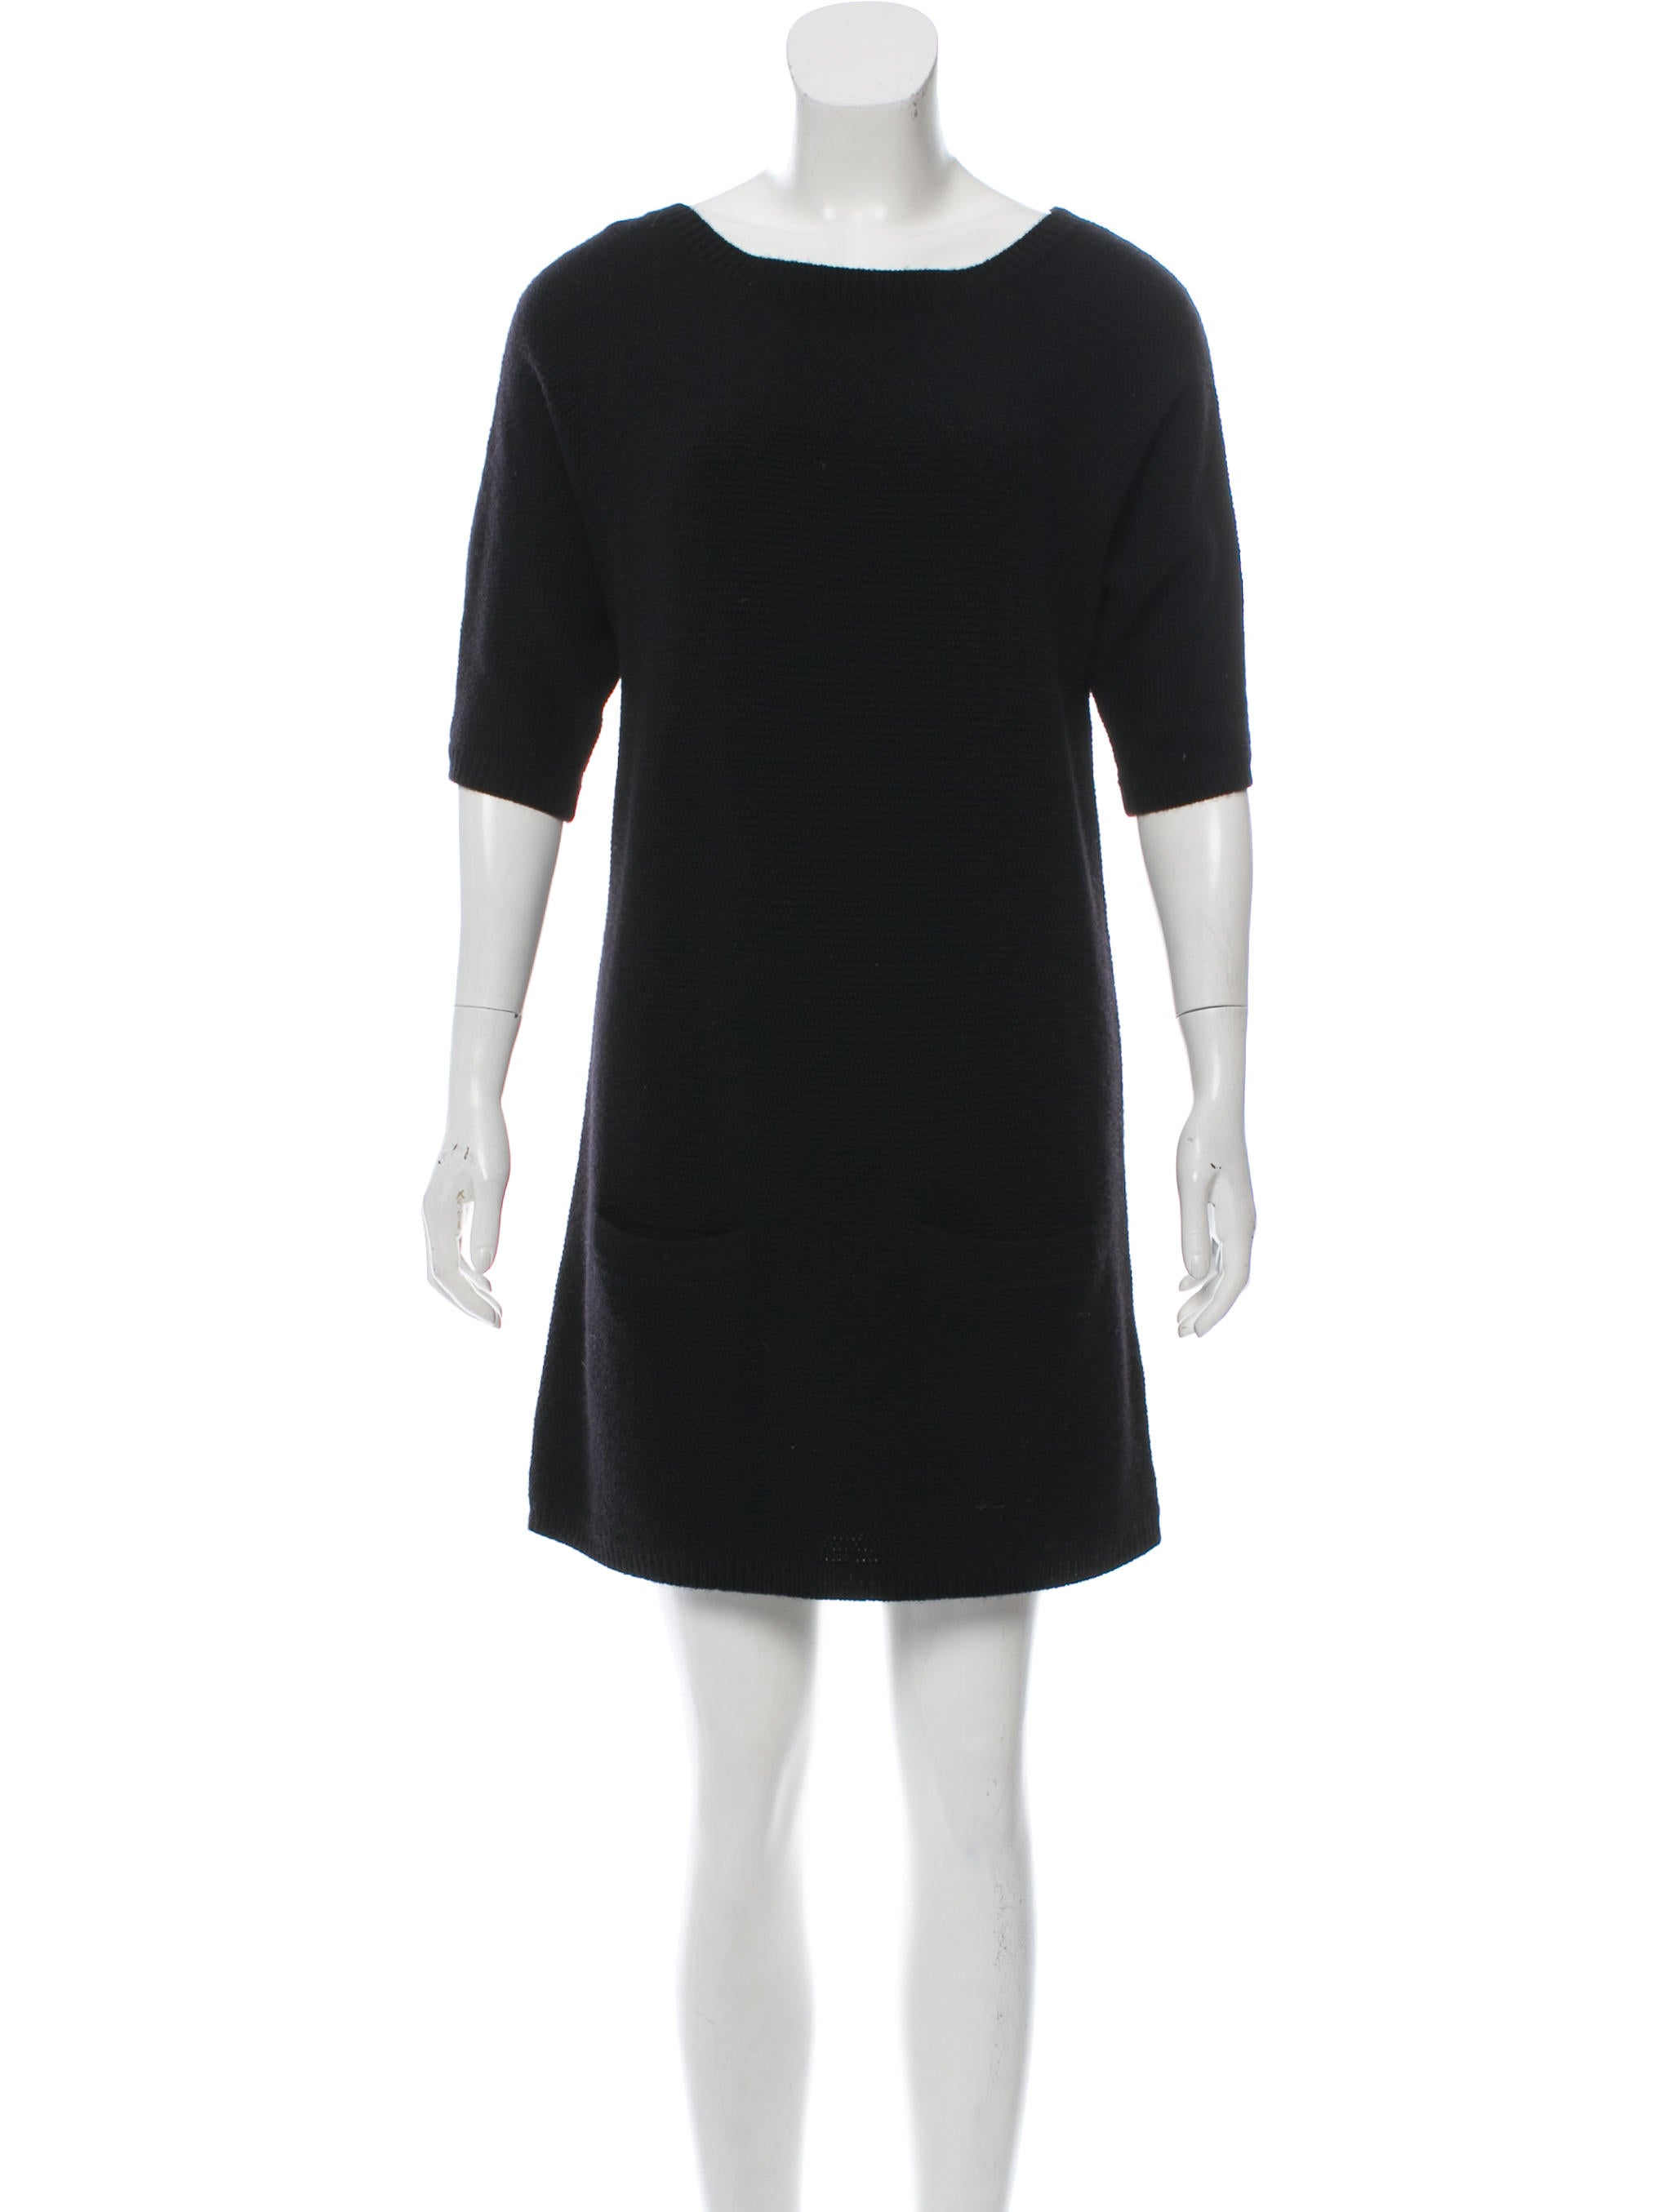 dc04df112d4 Chloé Cashmere Sweater Dress - Clothing - CHL88973